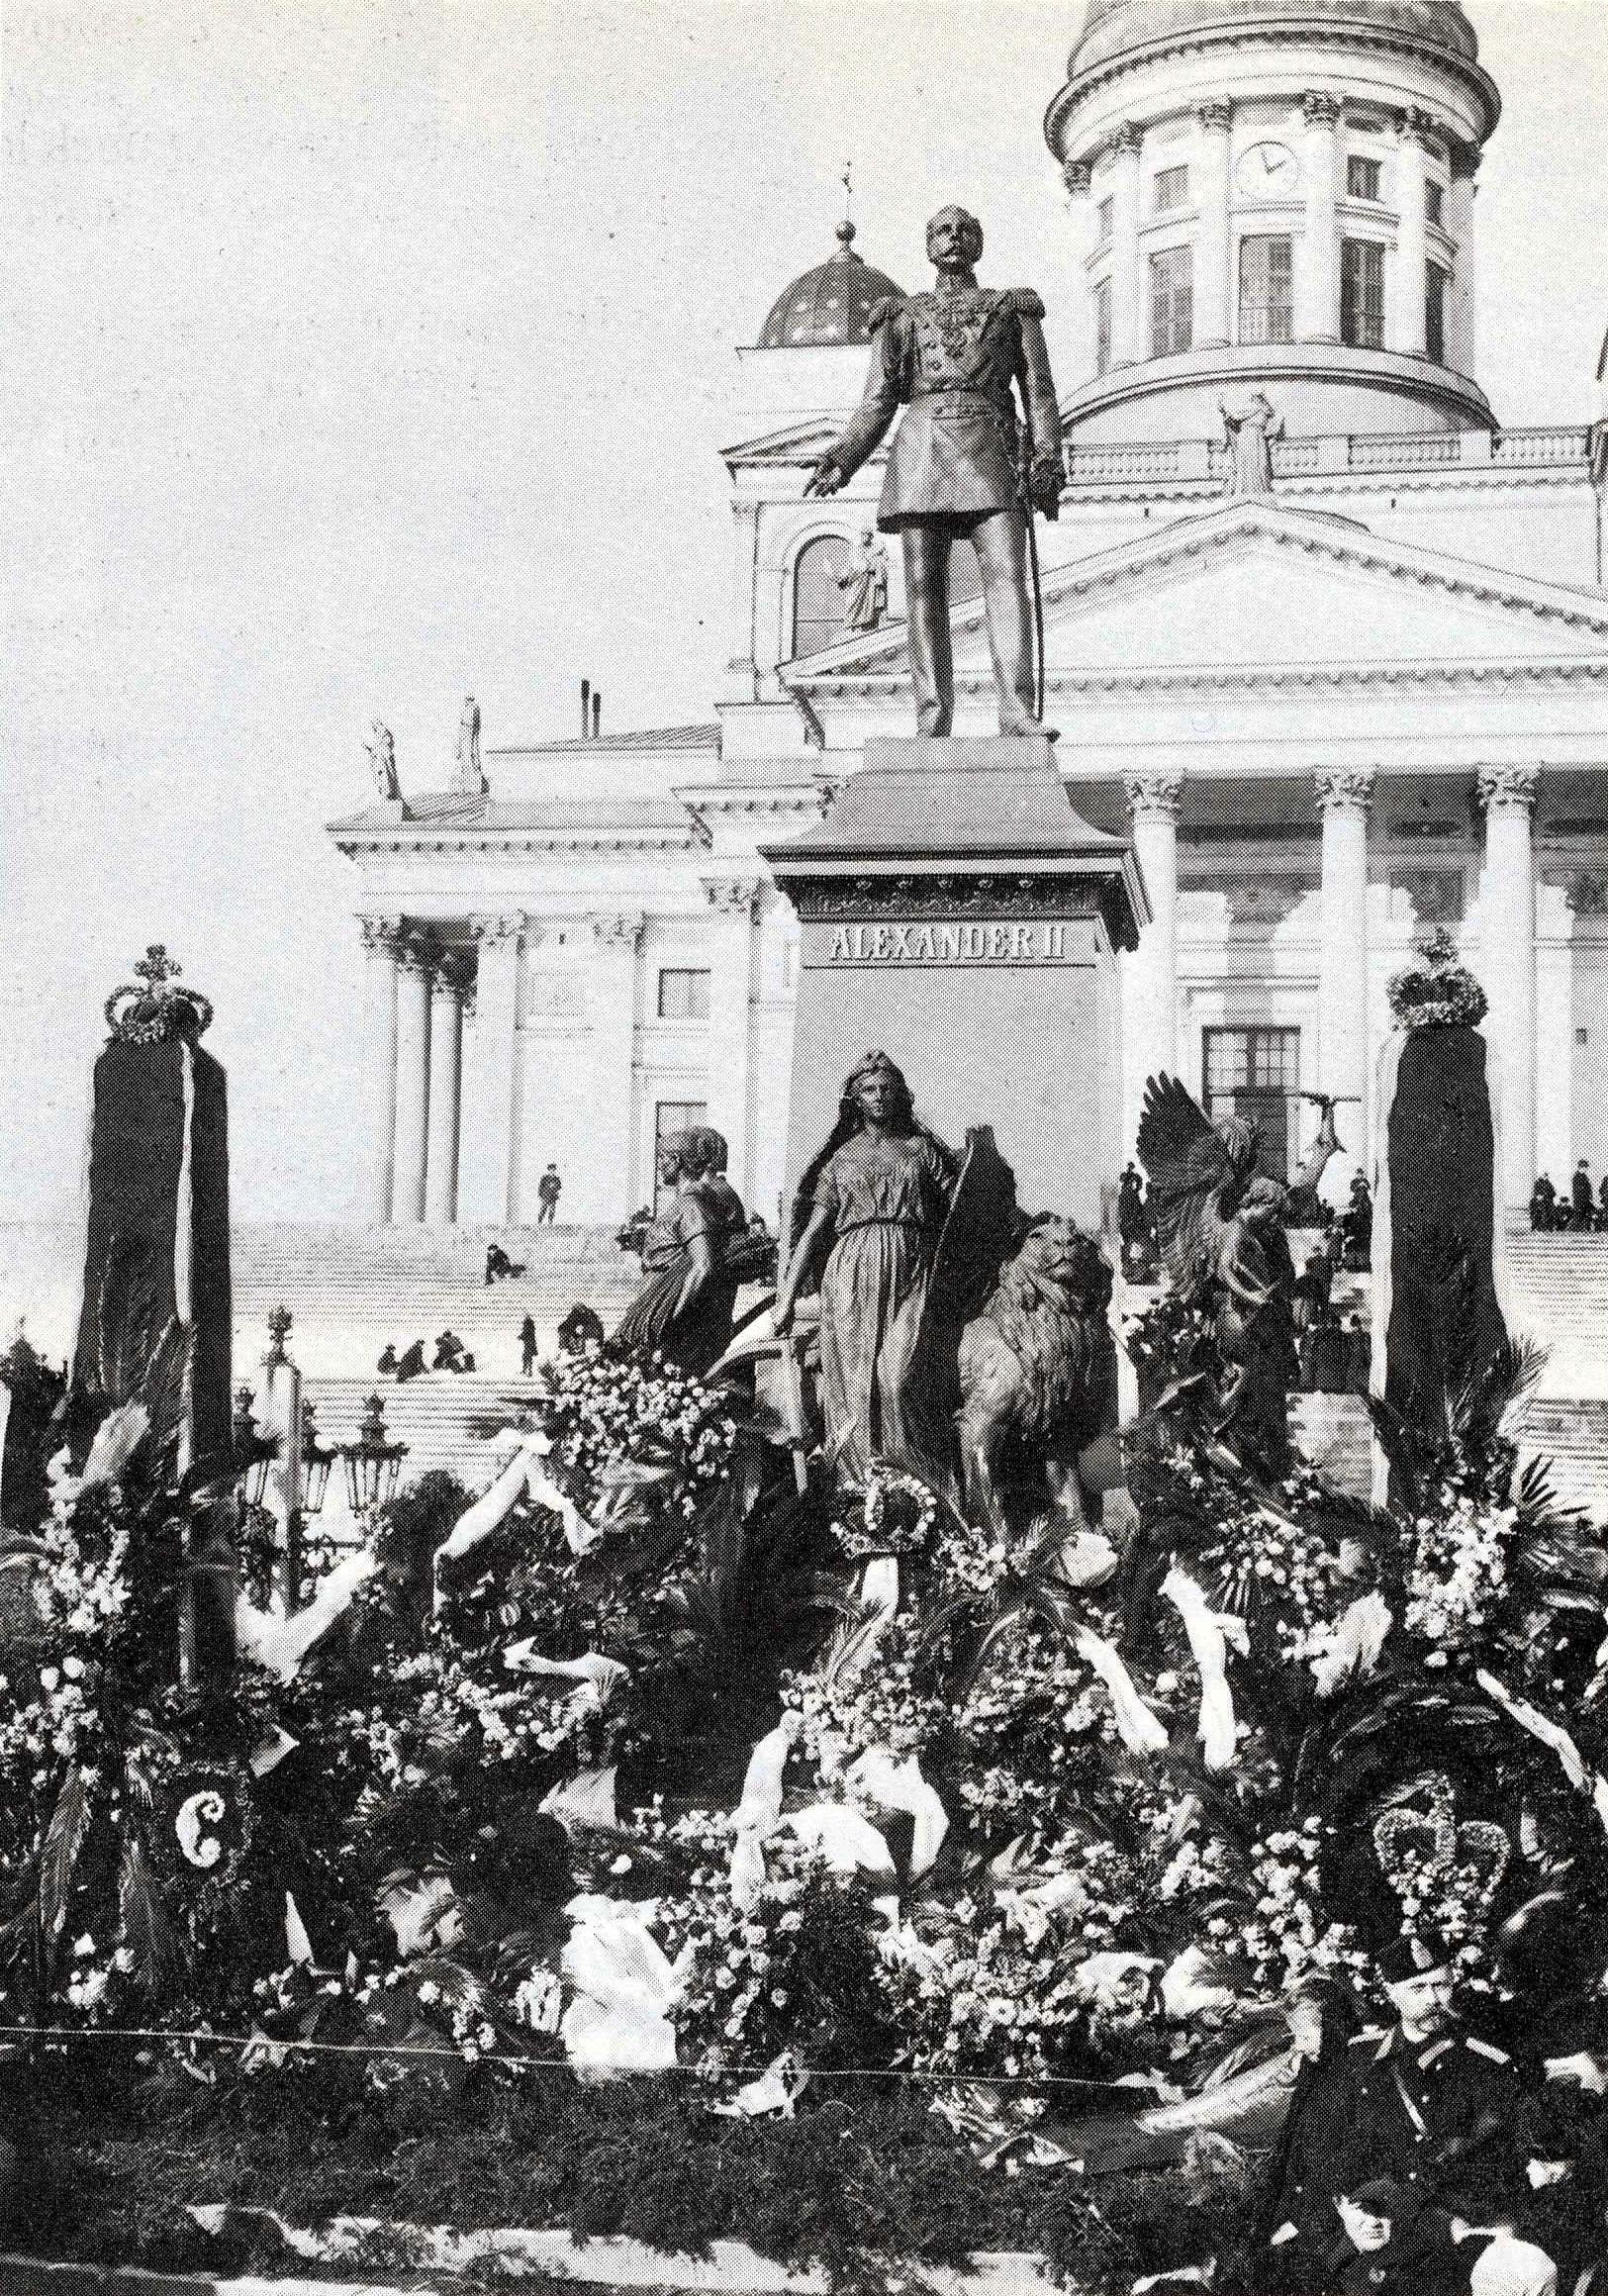 Kuvahaun tulos haulle aleksanteri II turku